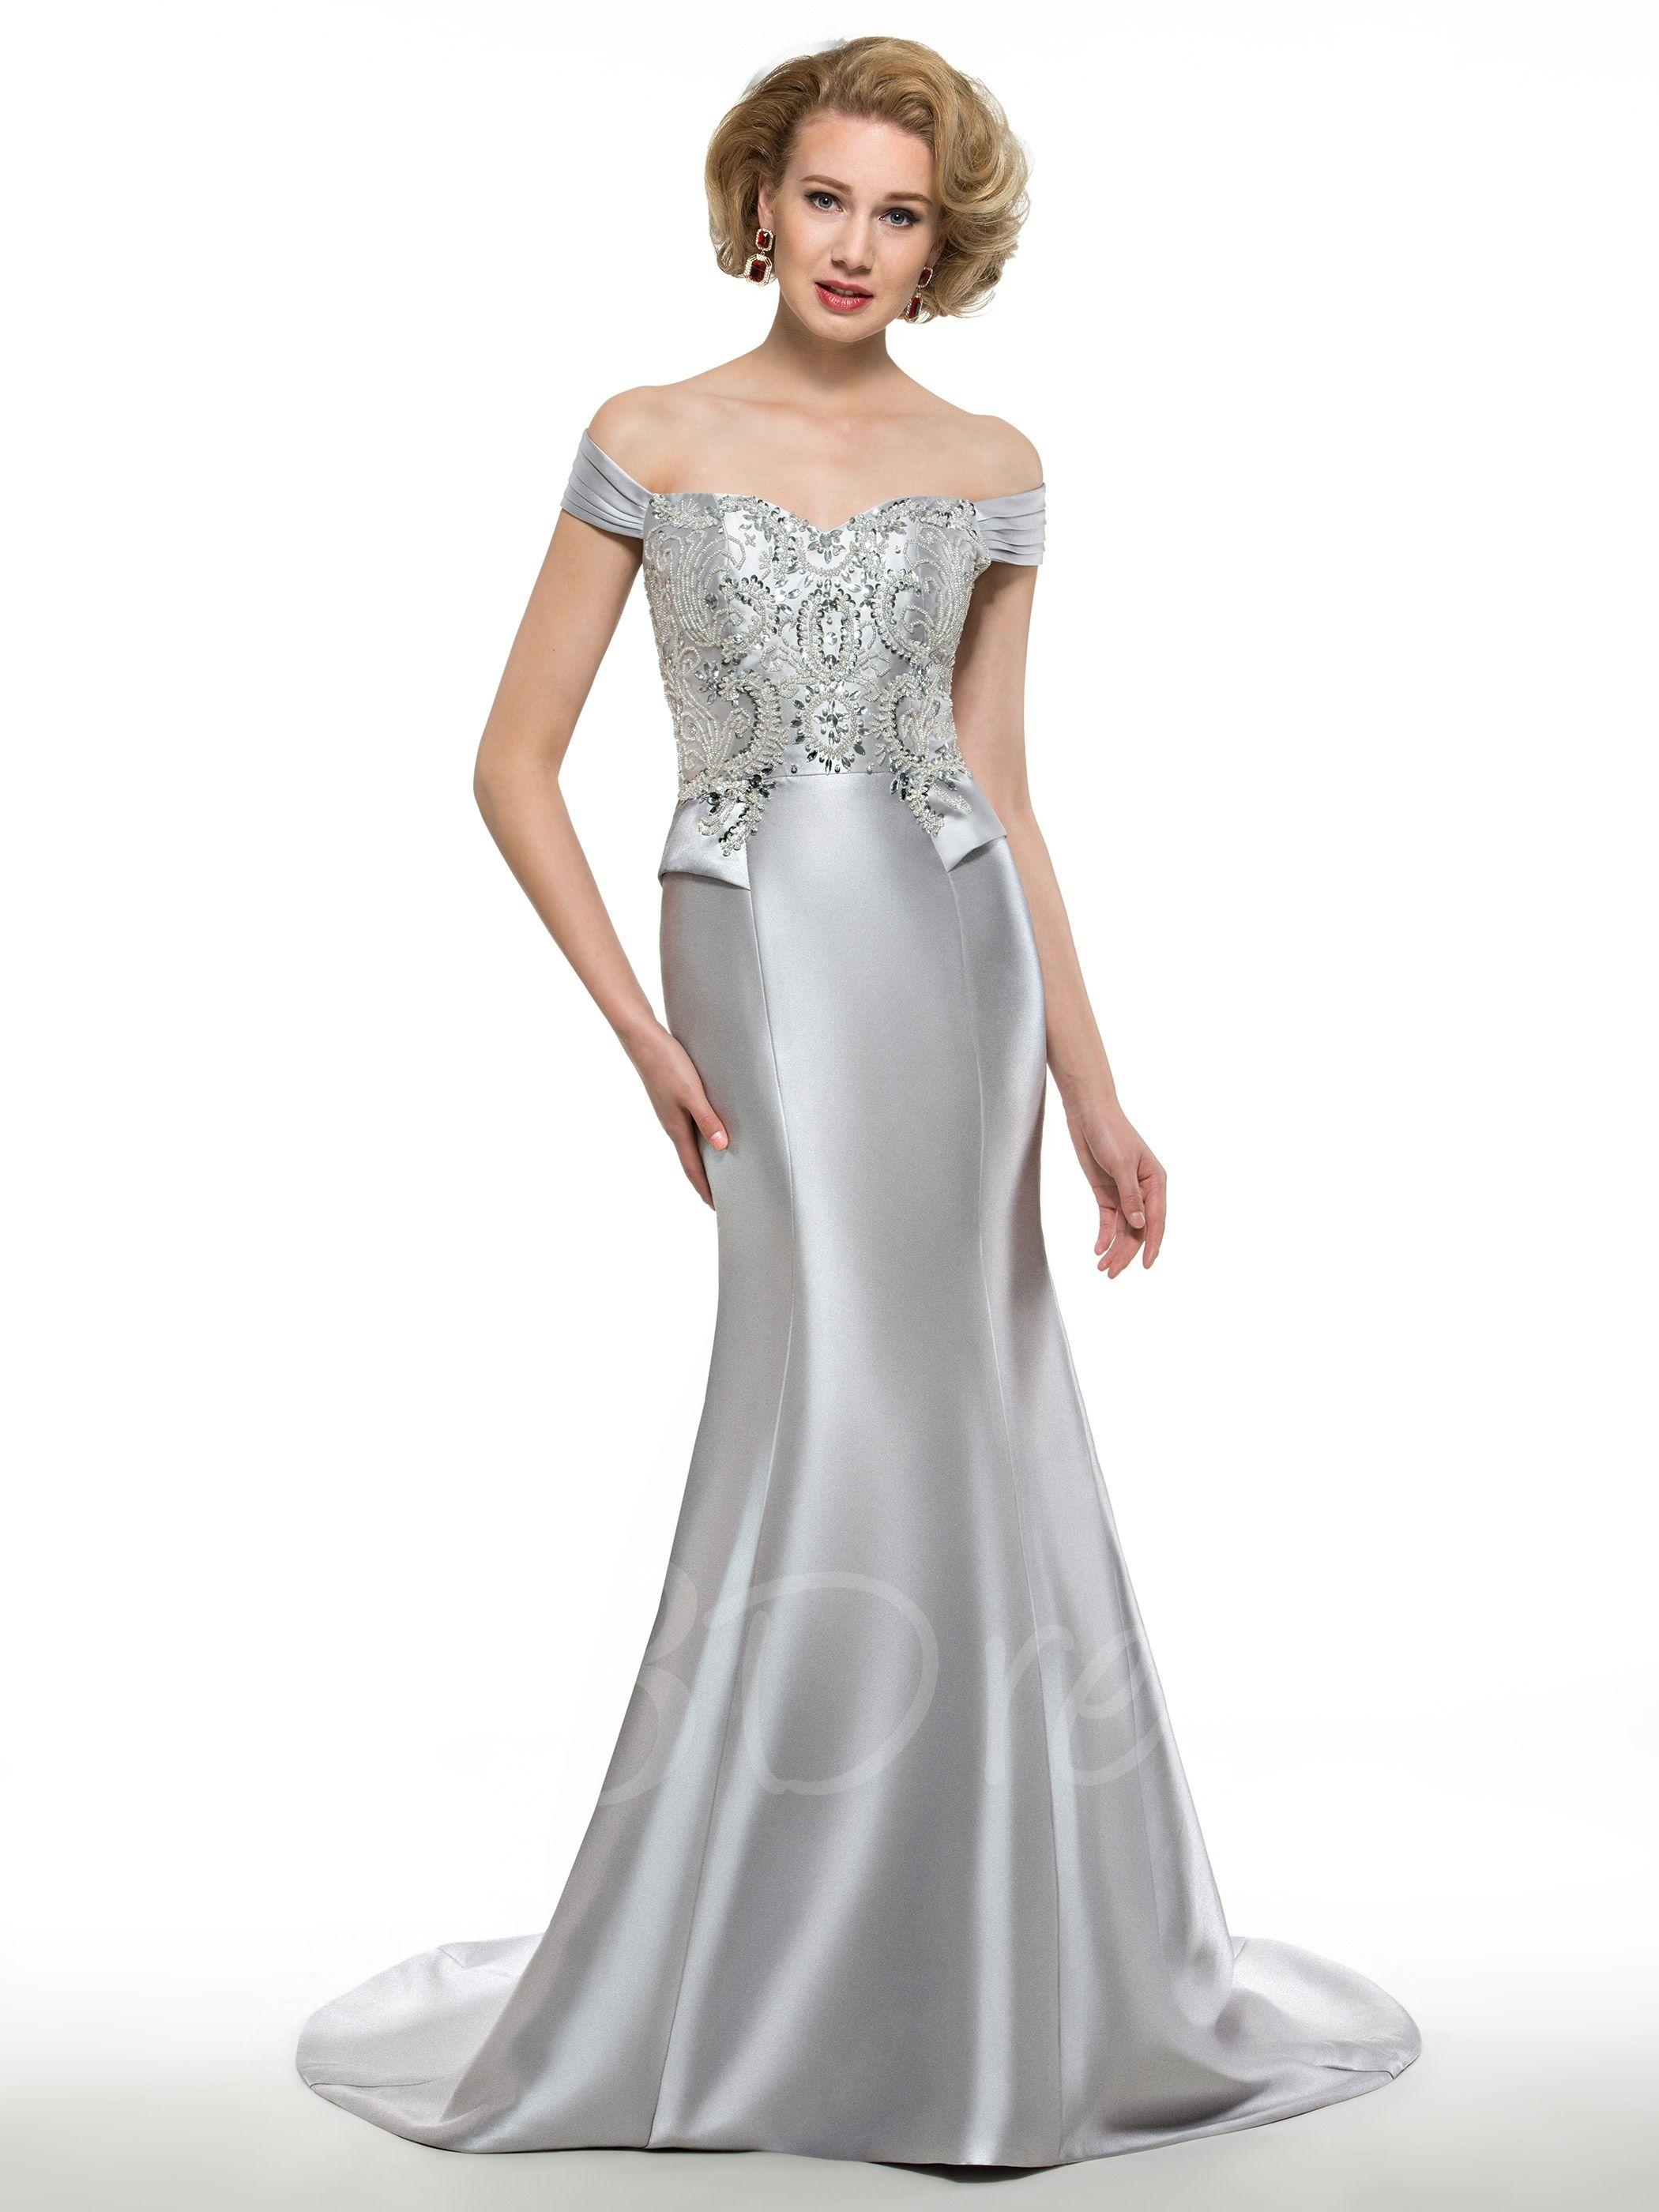 Off The Shoulder Beaded Mermaid Mother Dress Bride dress